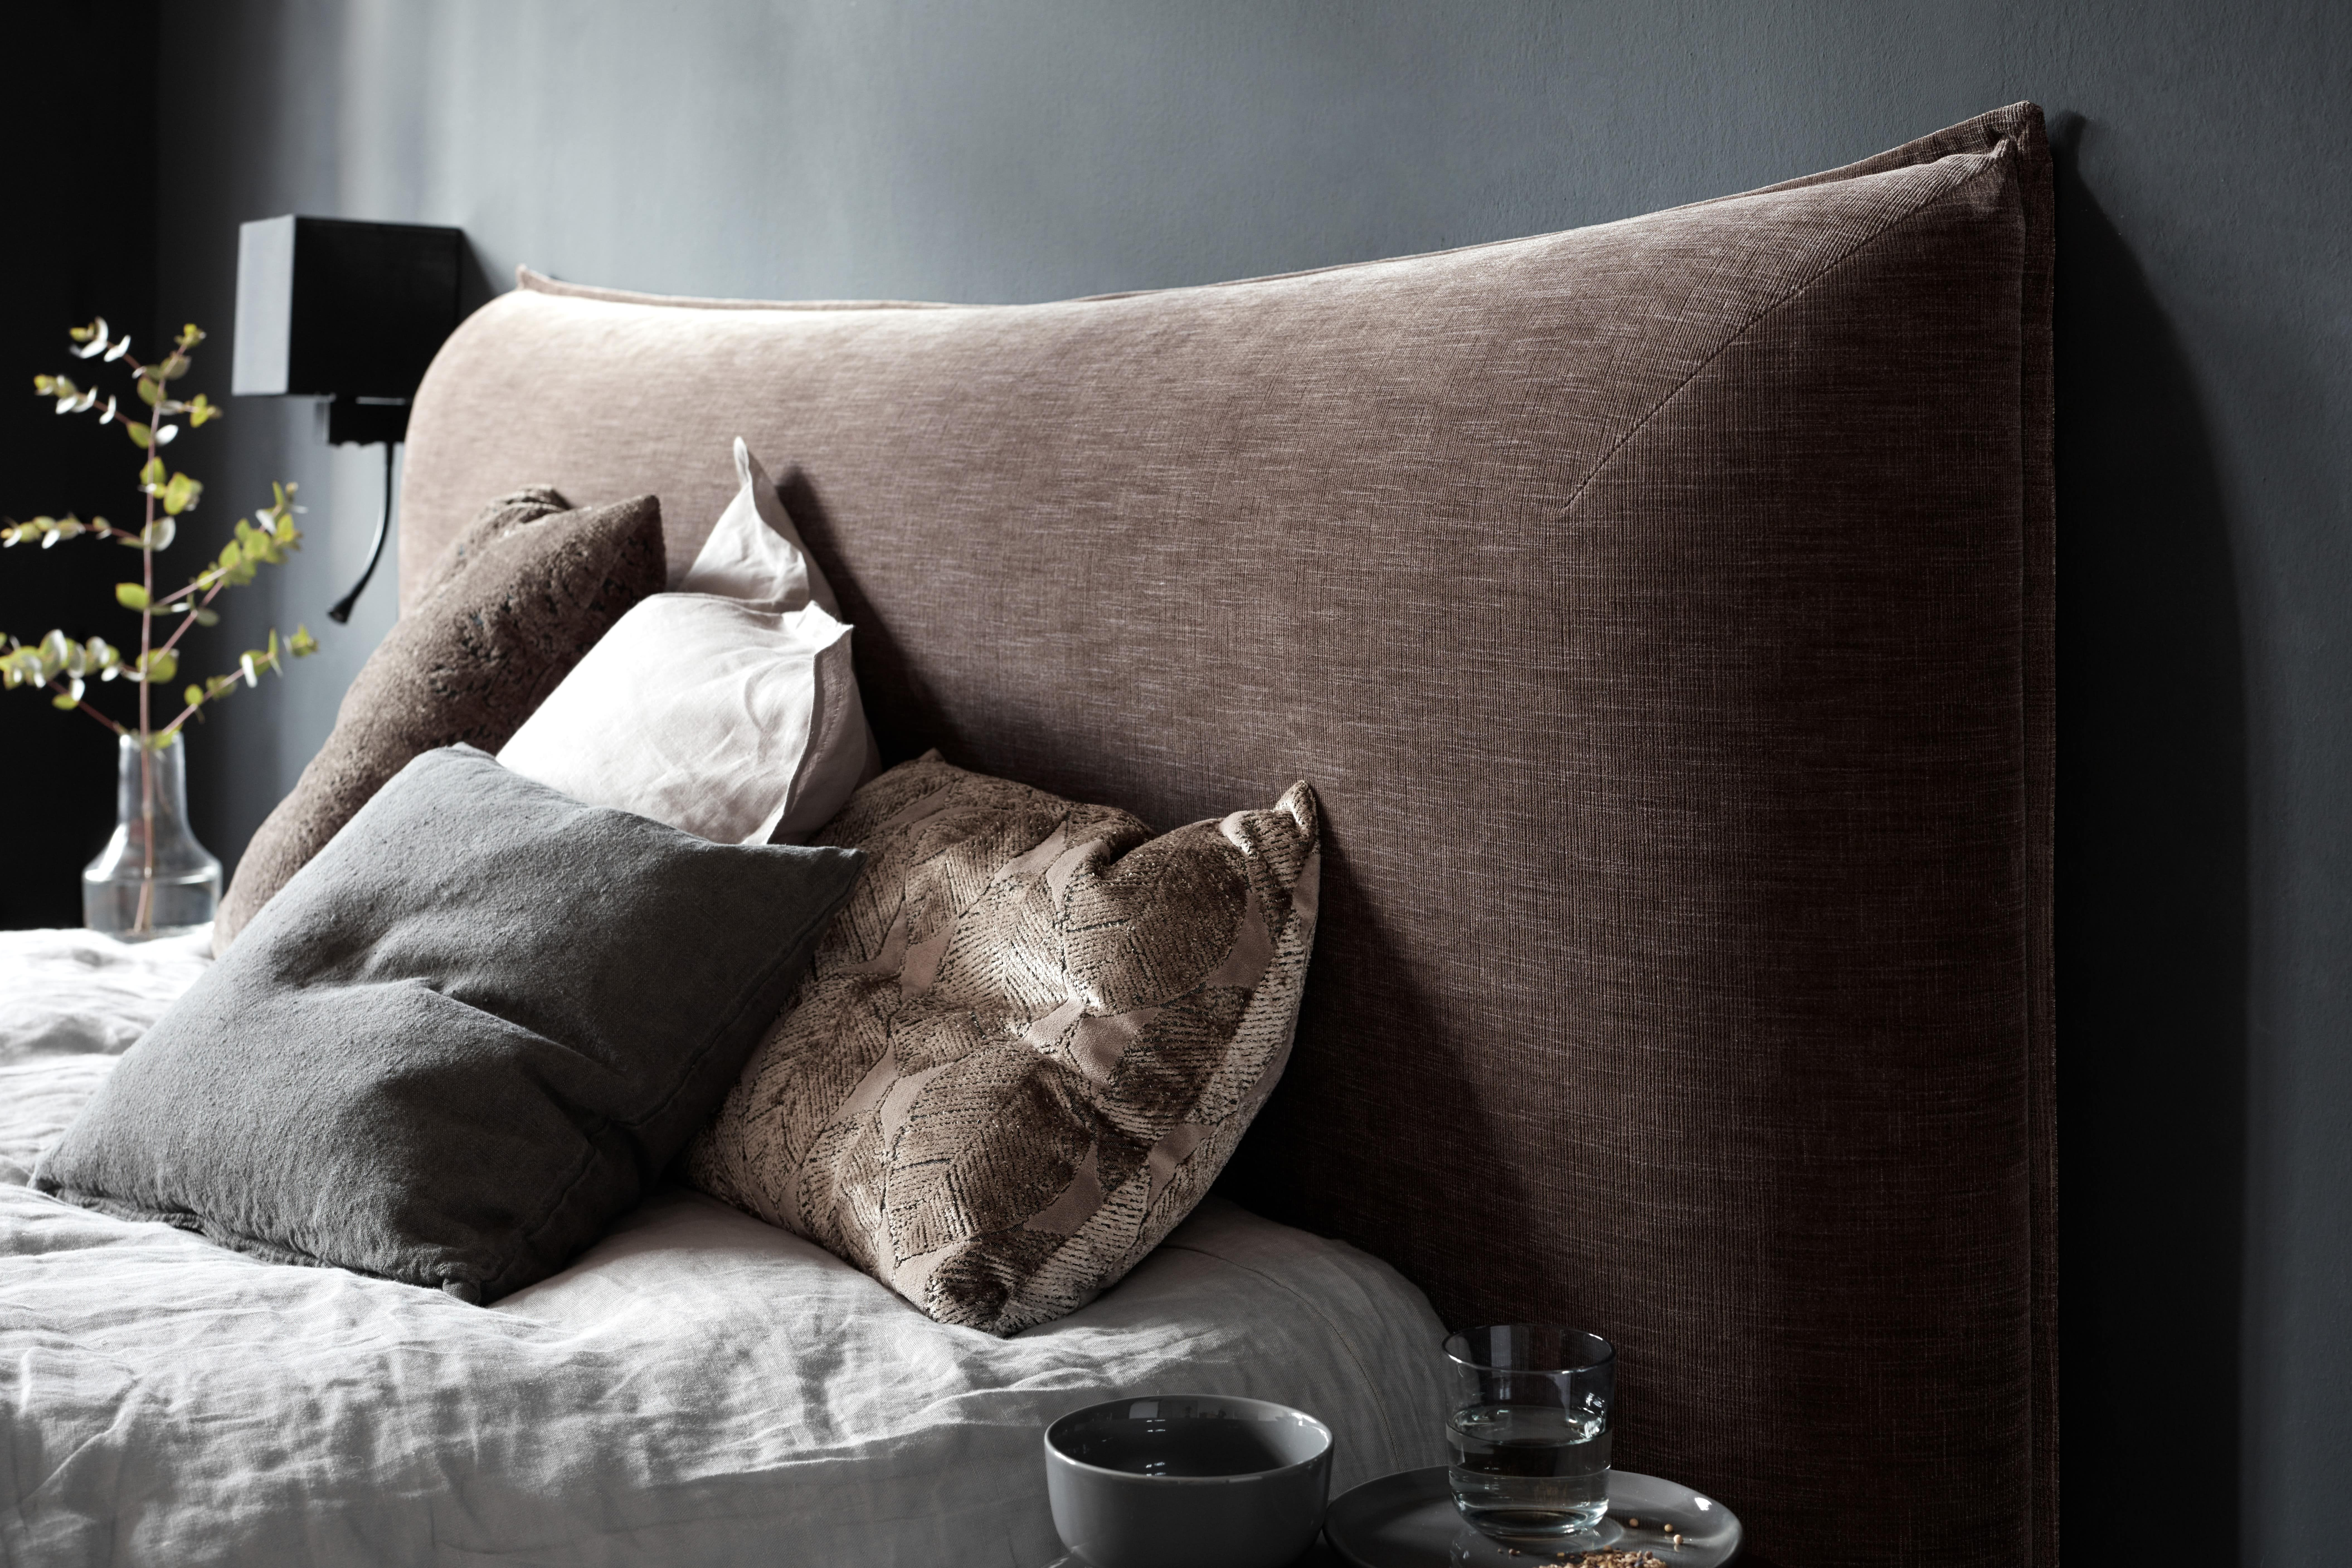 Gent Bett Kopfteil. #boconcept #interiordesign #interior  #scandinaviandesign #design